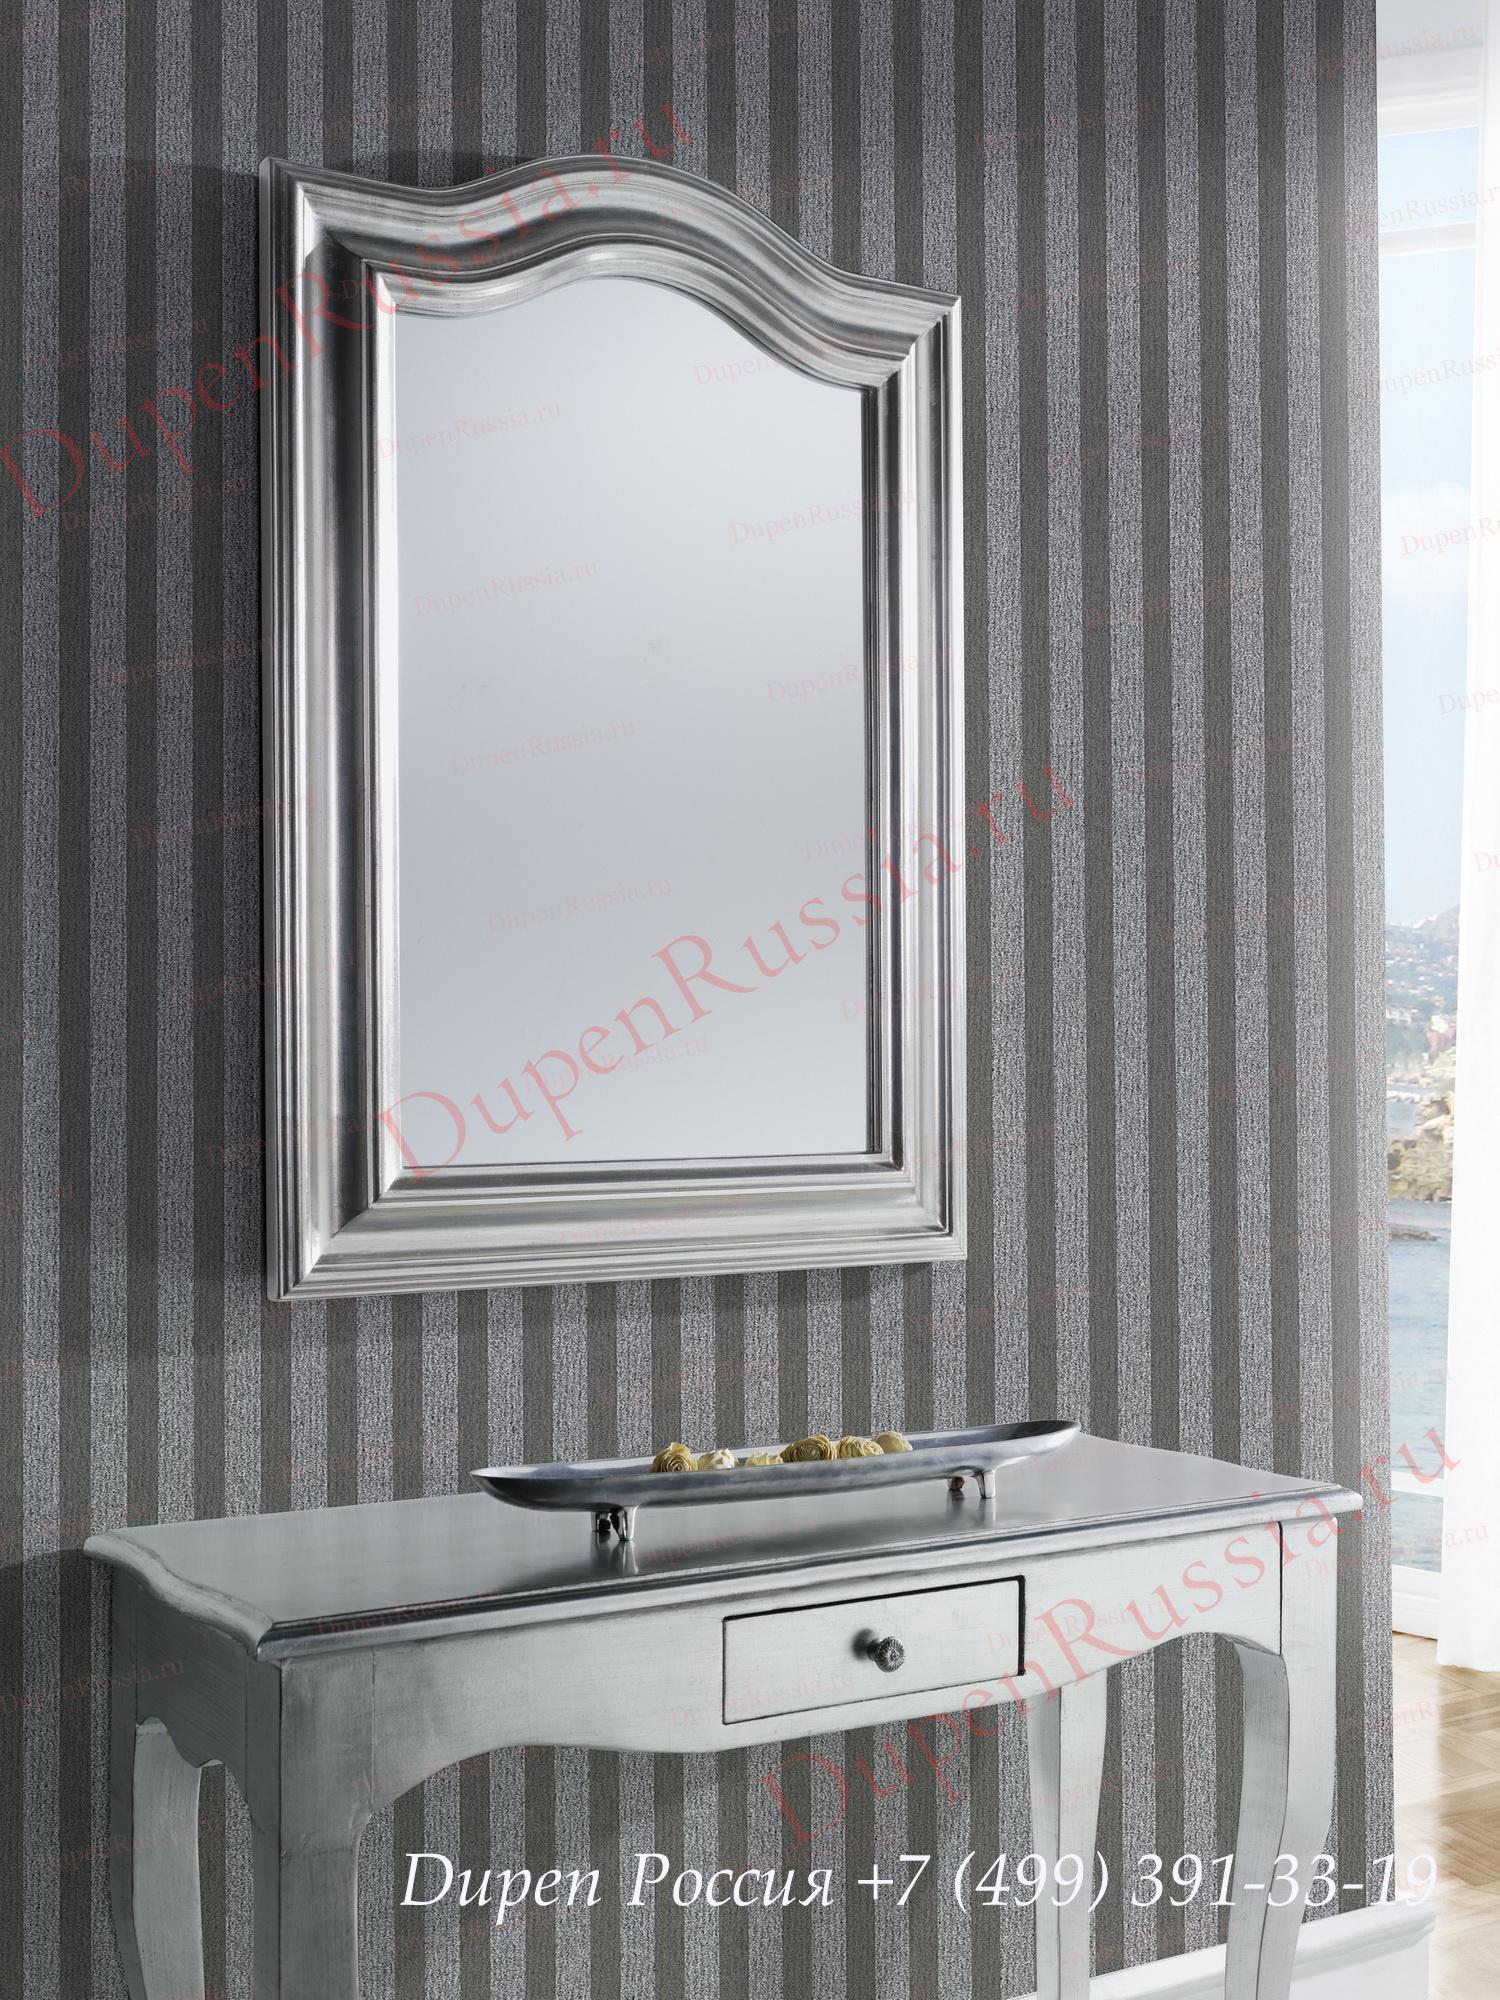 Зеркало DUPEN (Дюпен) E-204, консоль DUPEN K59